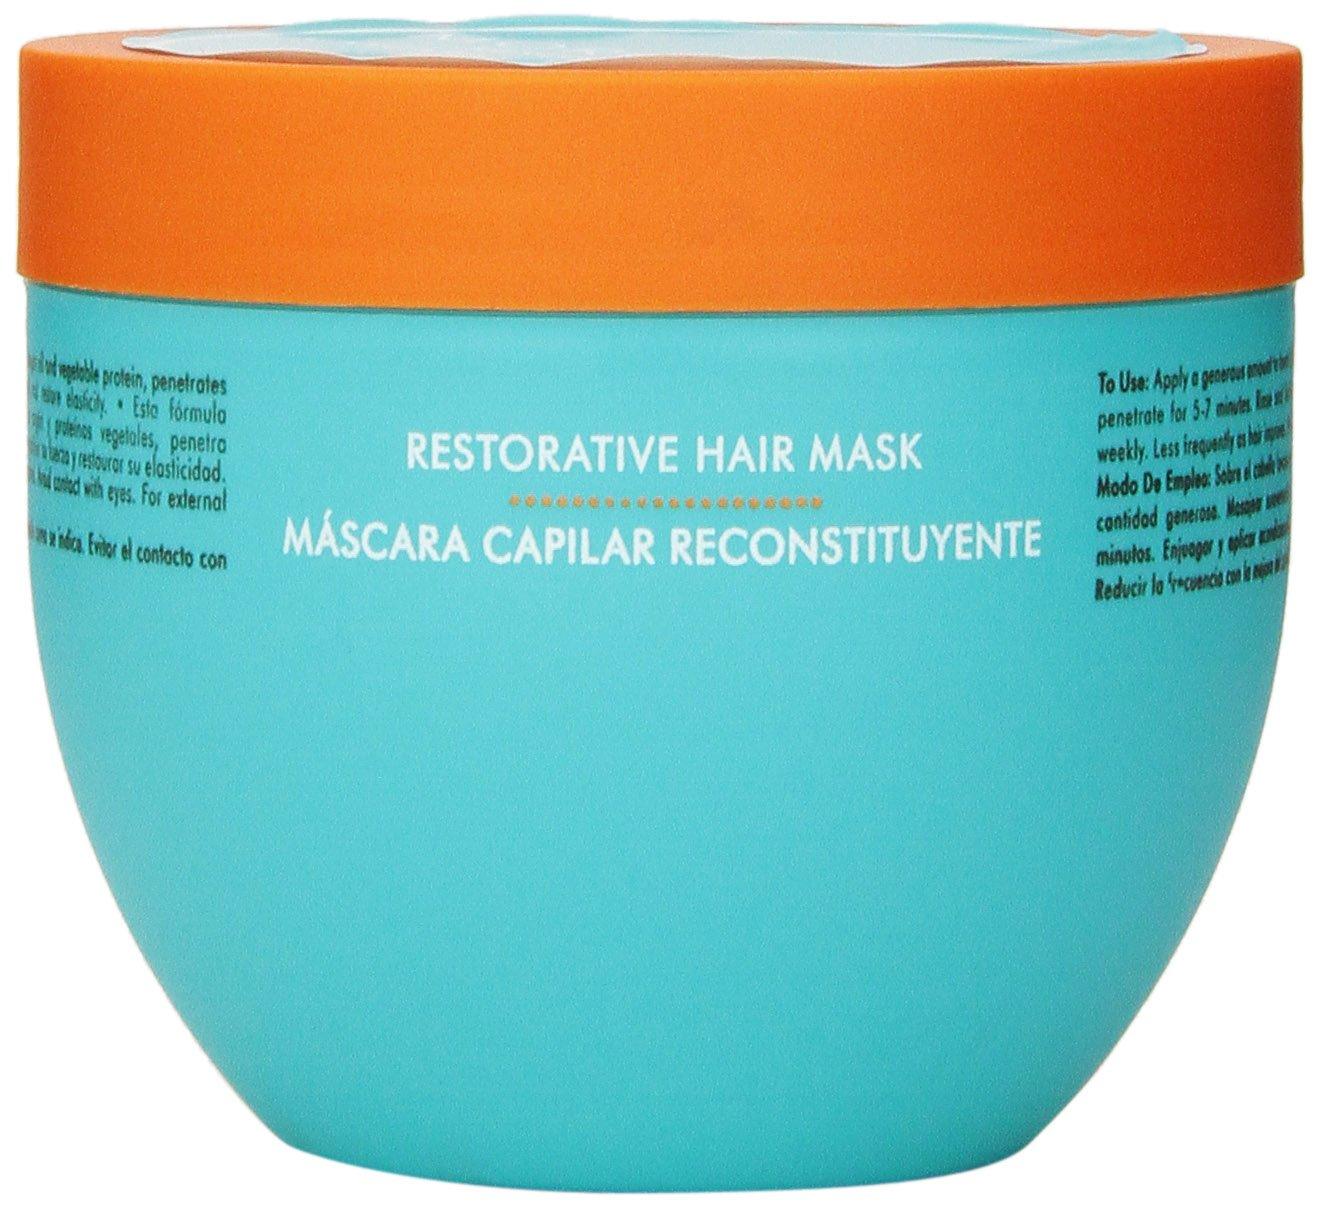 REPARATUR aurativen Haar-Maske 500 ml MOROCCANOIL 7290011521158 56719_-200ml